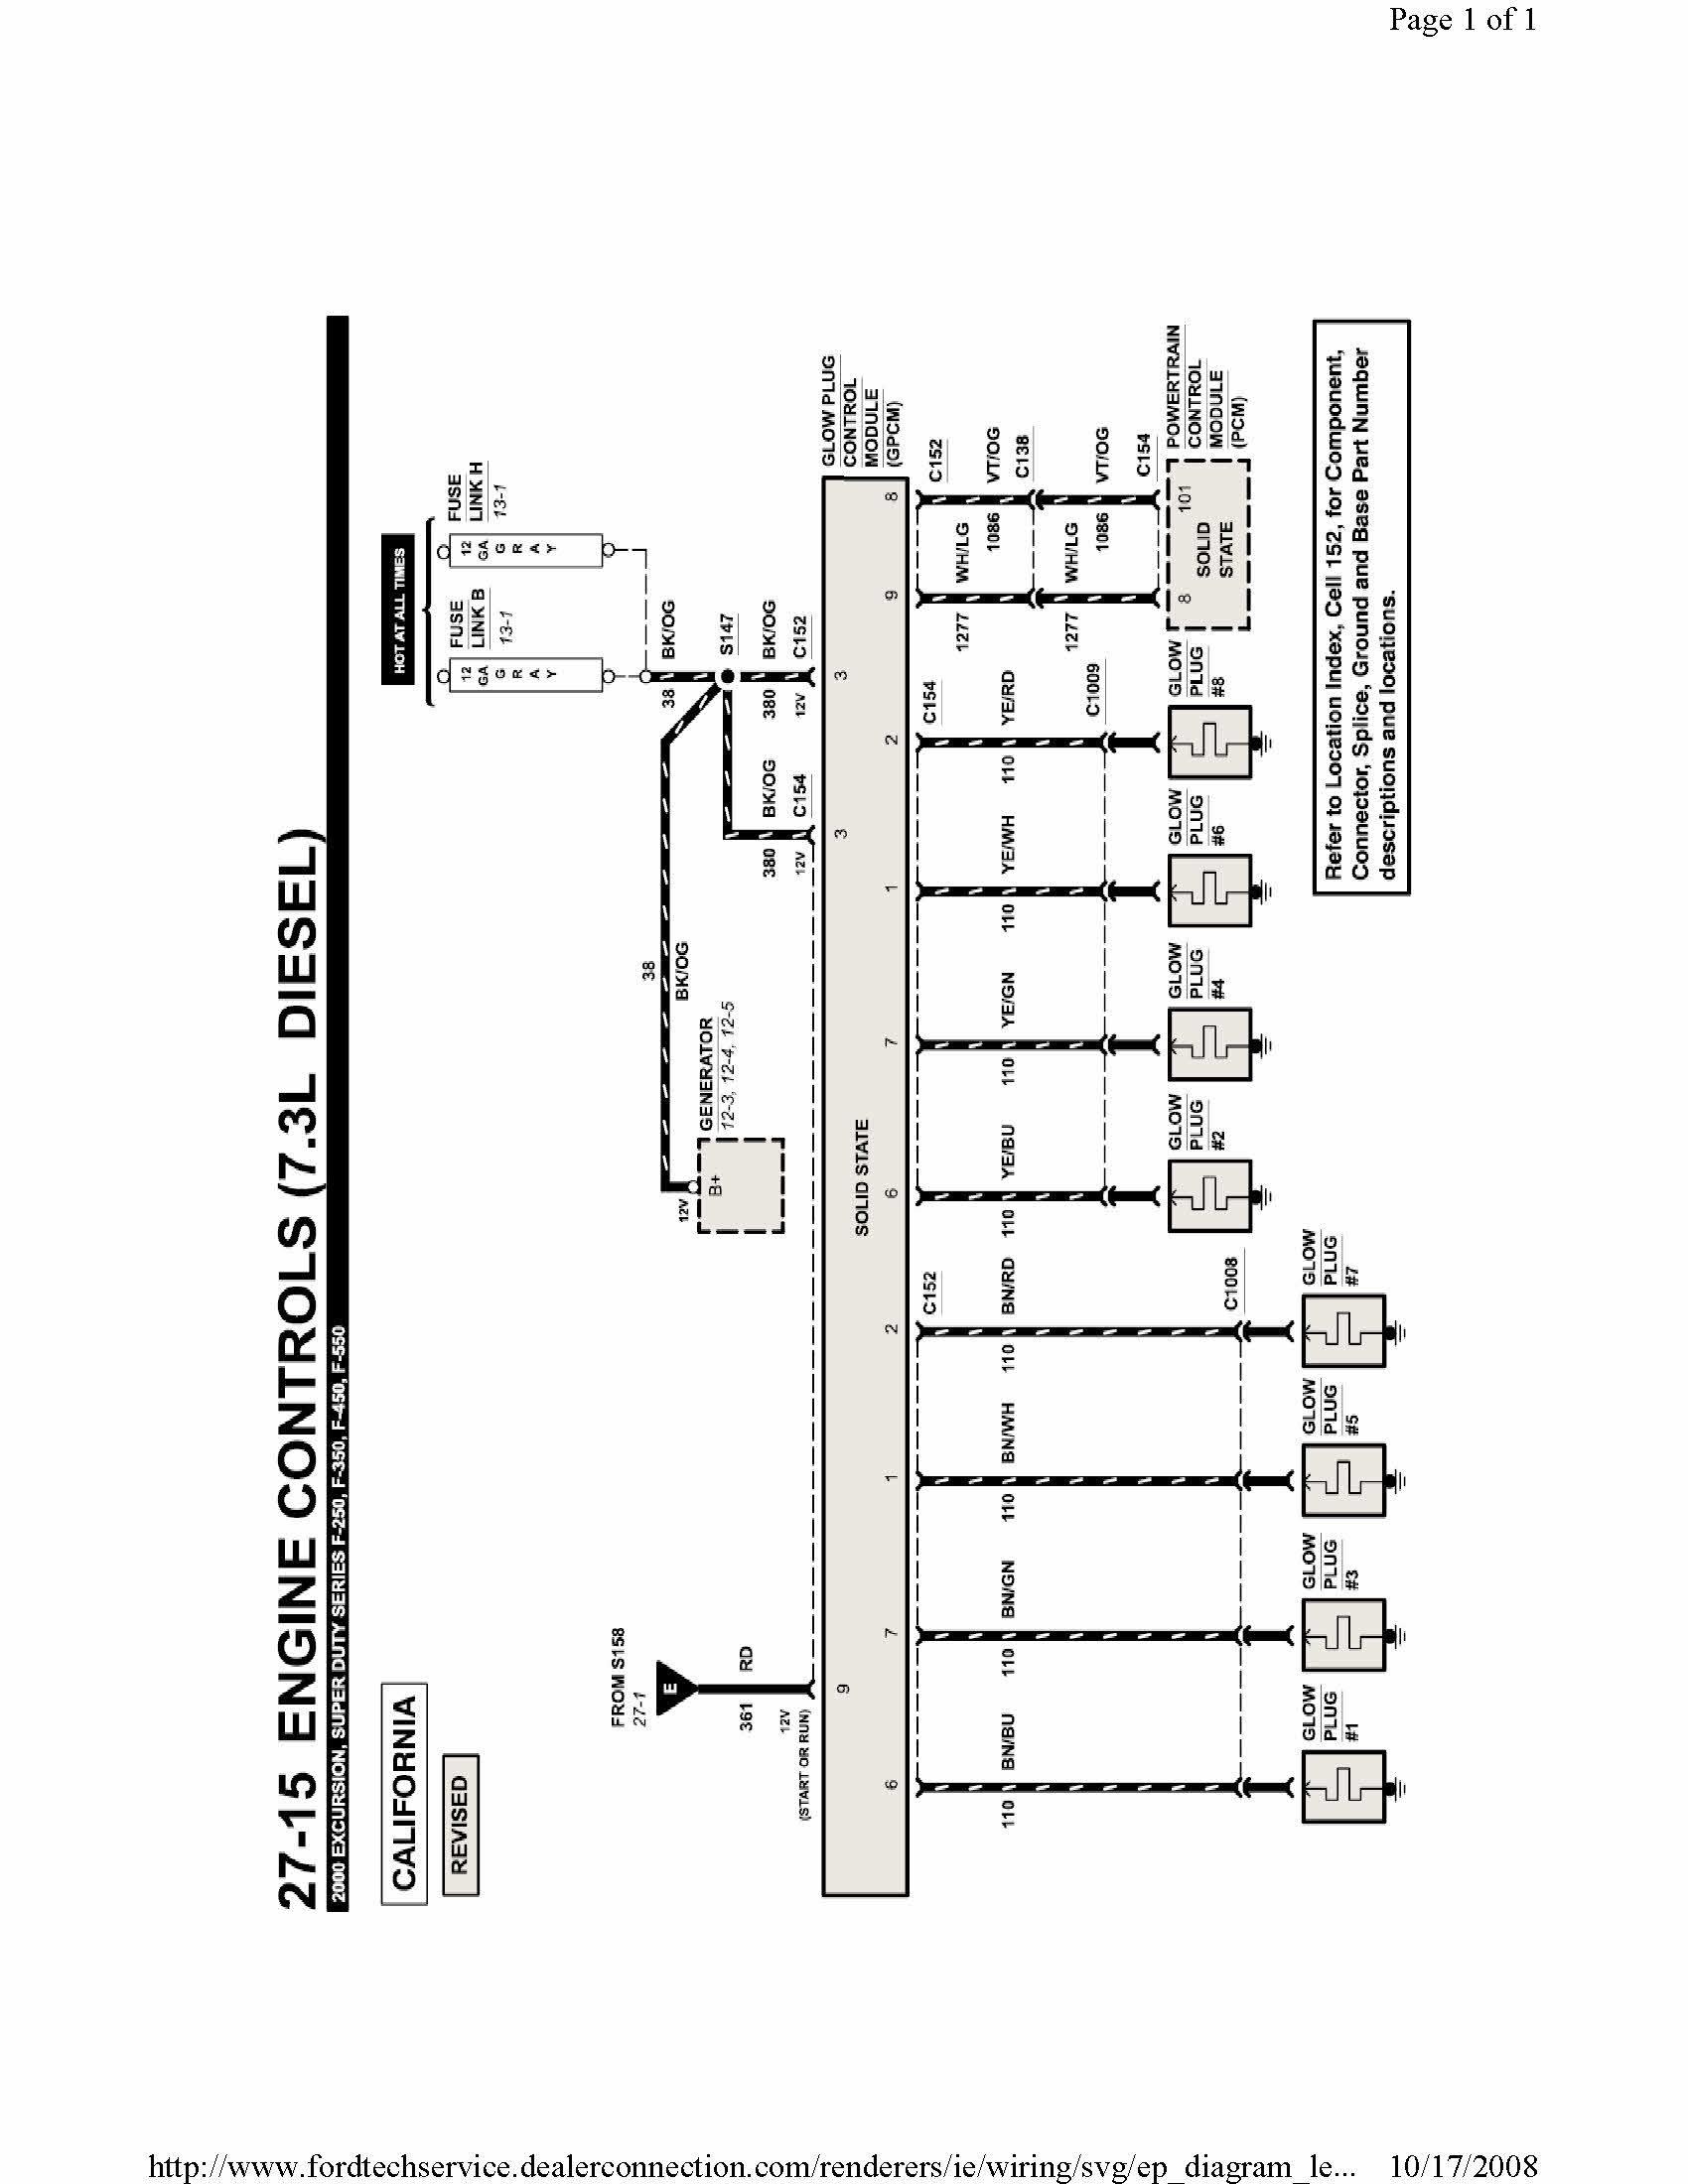 2008-10-17_173127_glow_plug_controller  Glow Plug Relay Wiring Diagram on